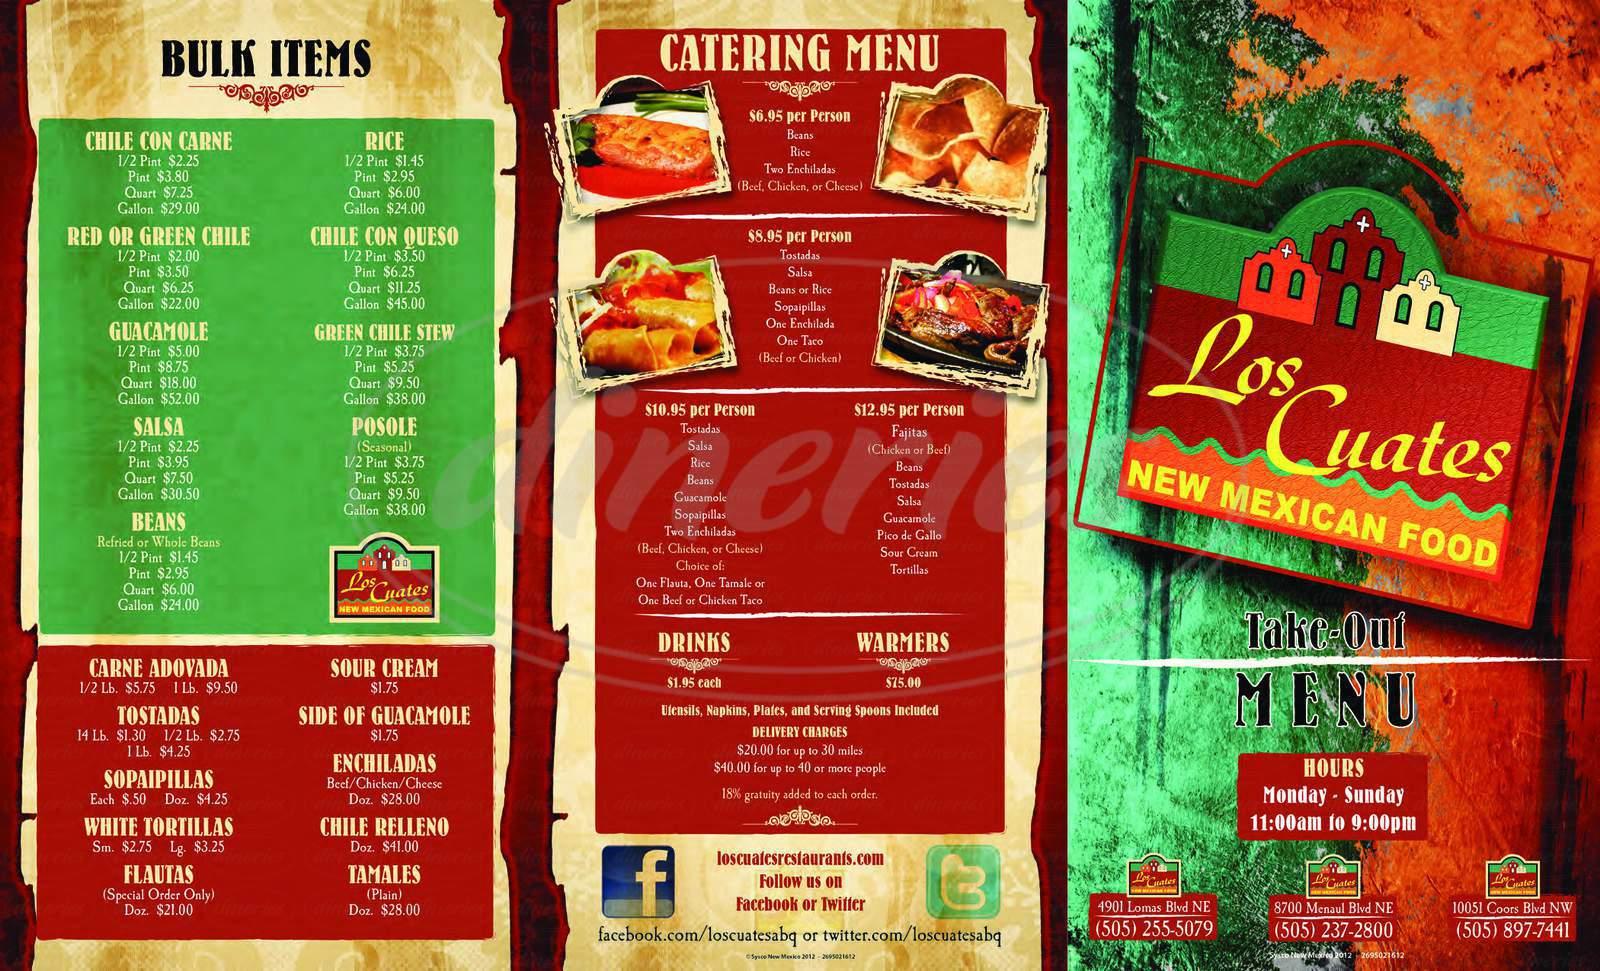 menu for Los Cuates New Mexican Food